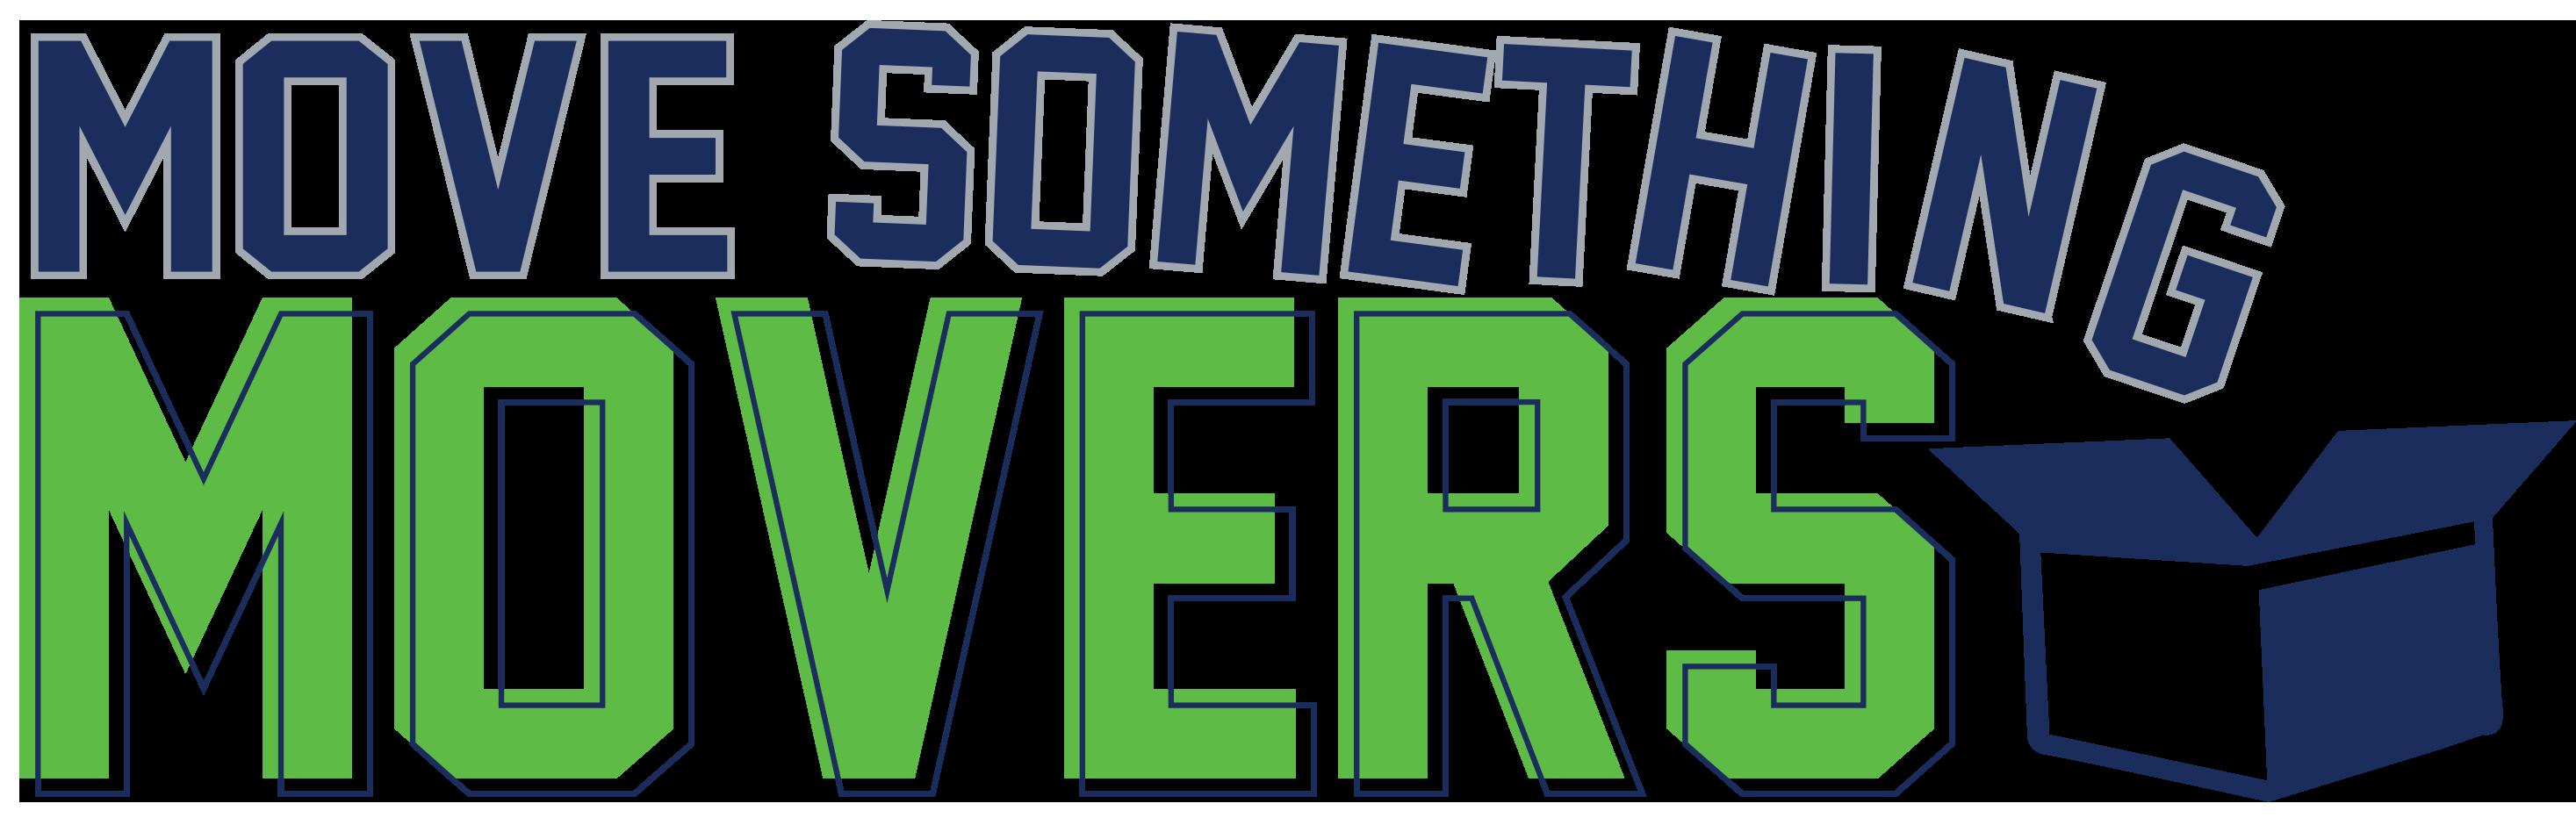 Move Something Movers Logo